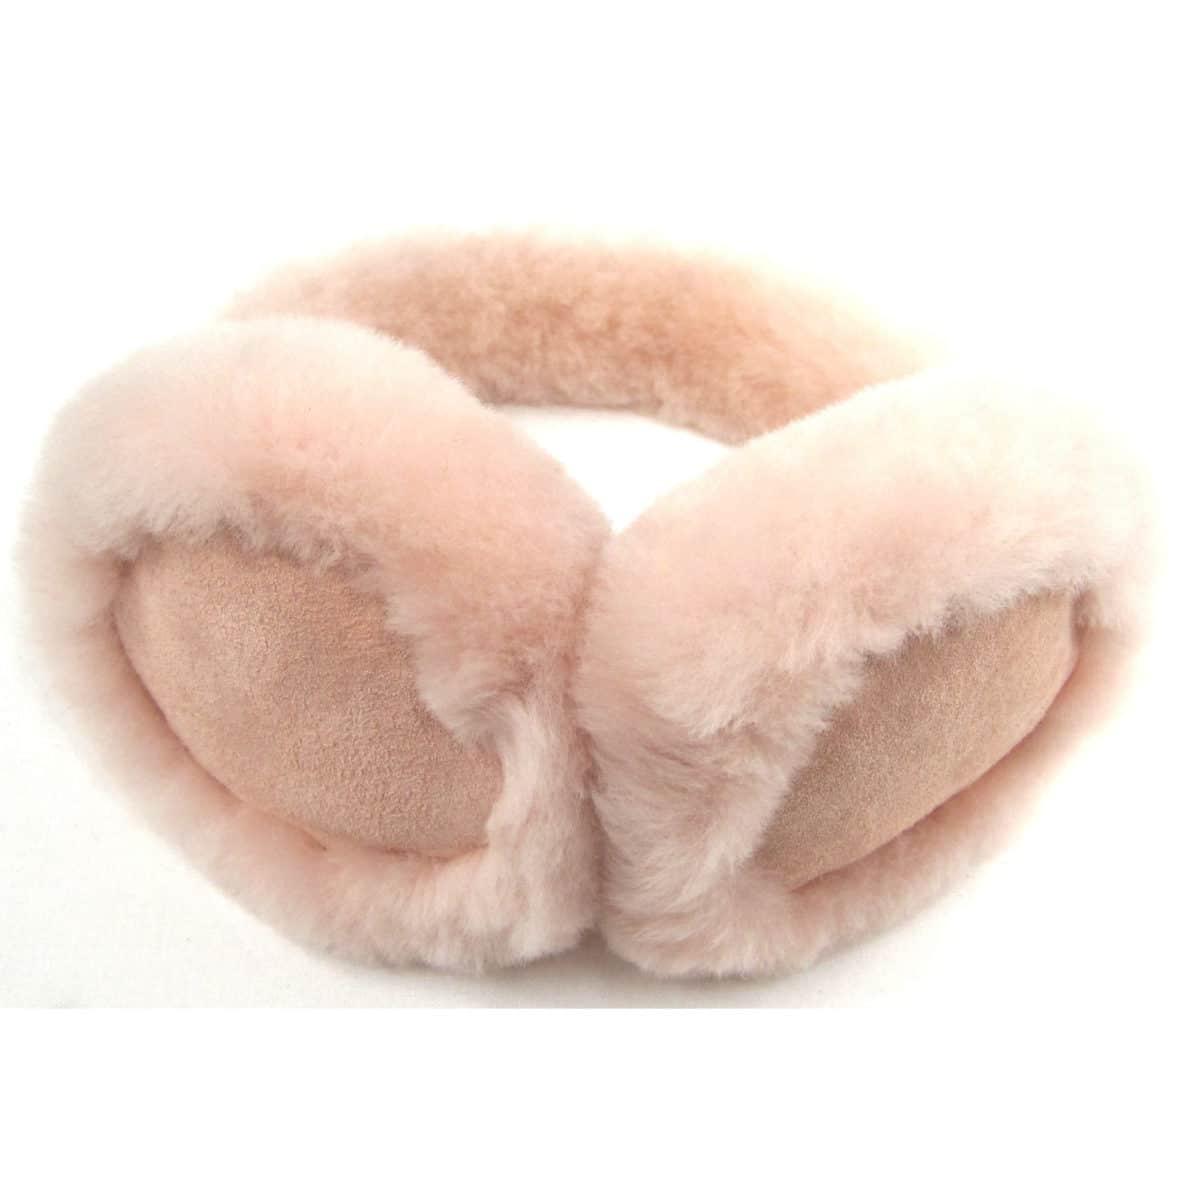 Childrens Sheepskin Earmuffs - Pink